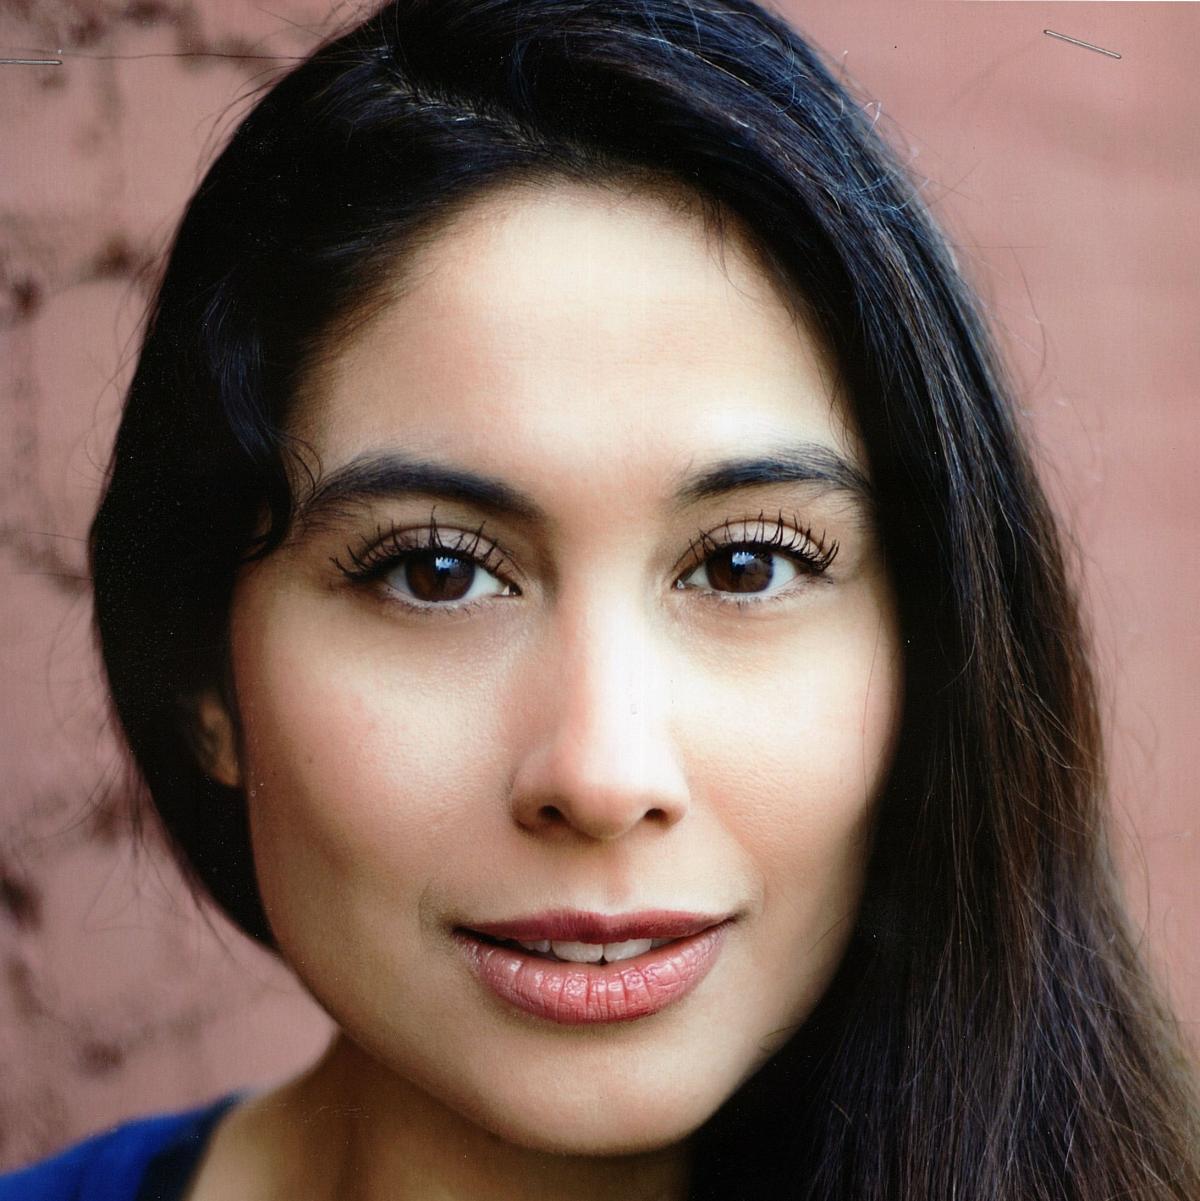 Dallas actor Stephanie Cleghorn Jasso